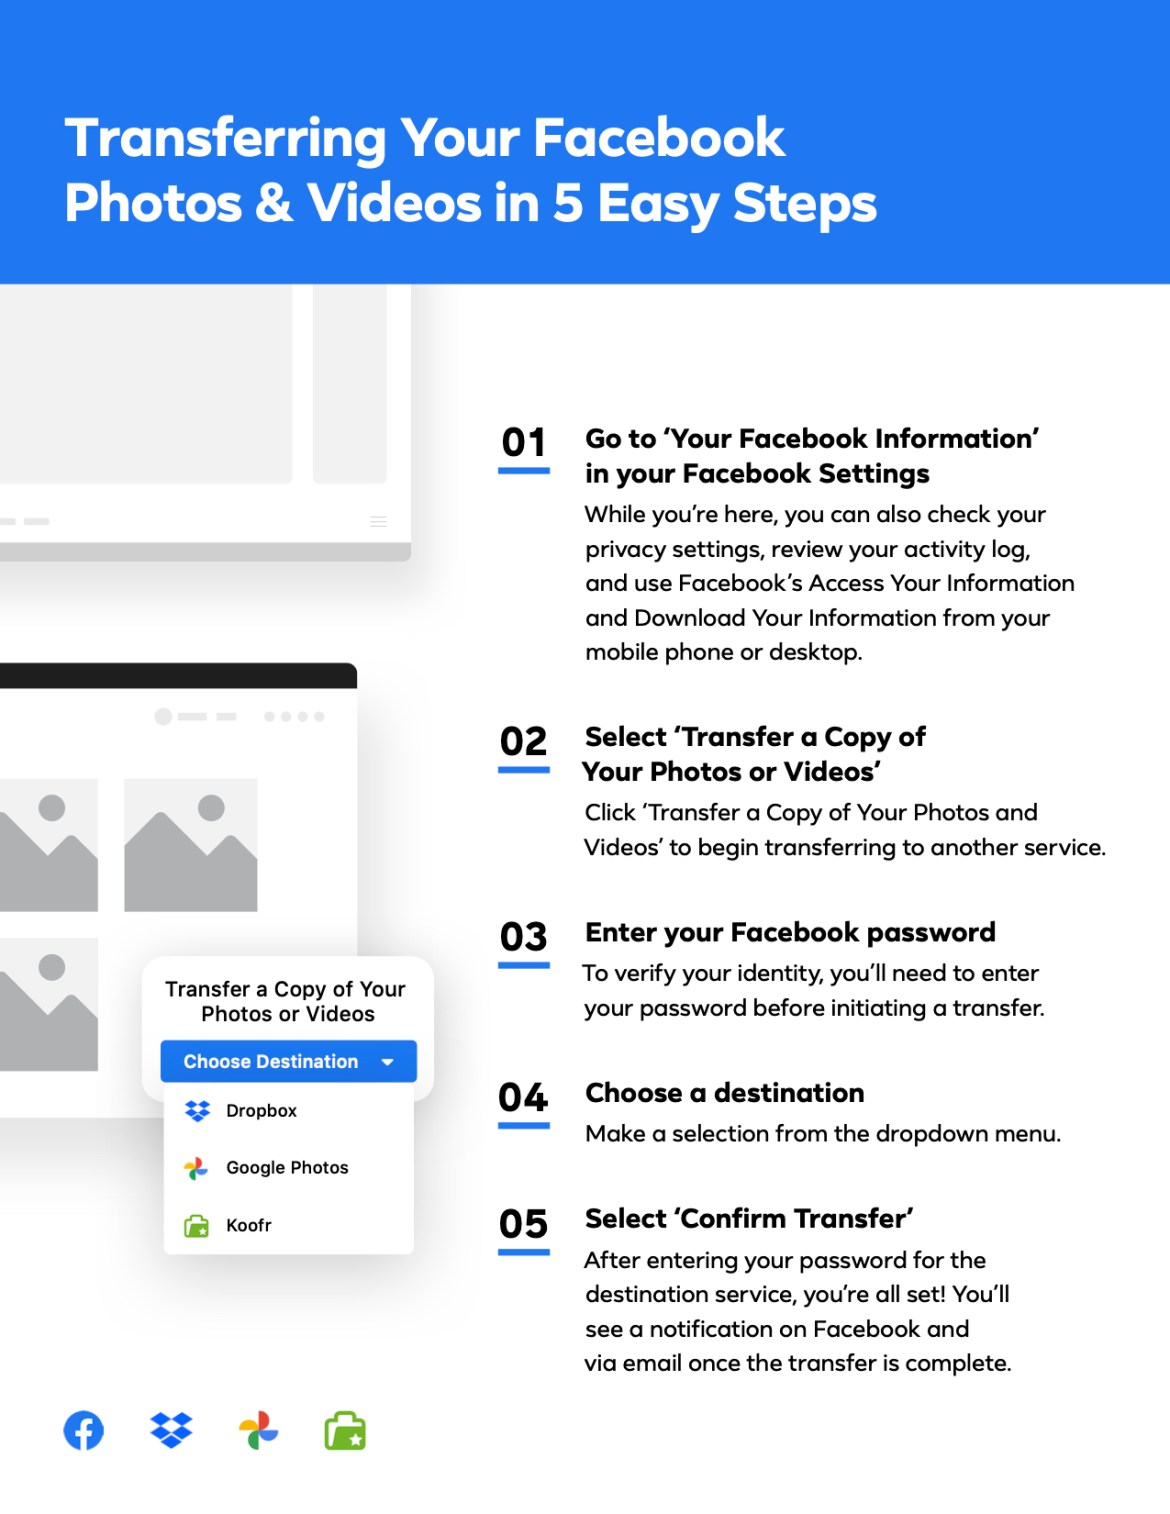 How to Transfer Your Facebook Photos Videos